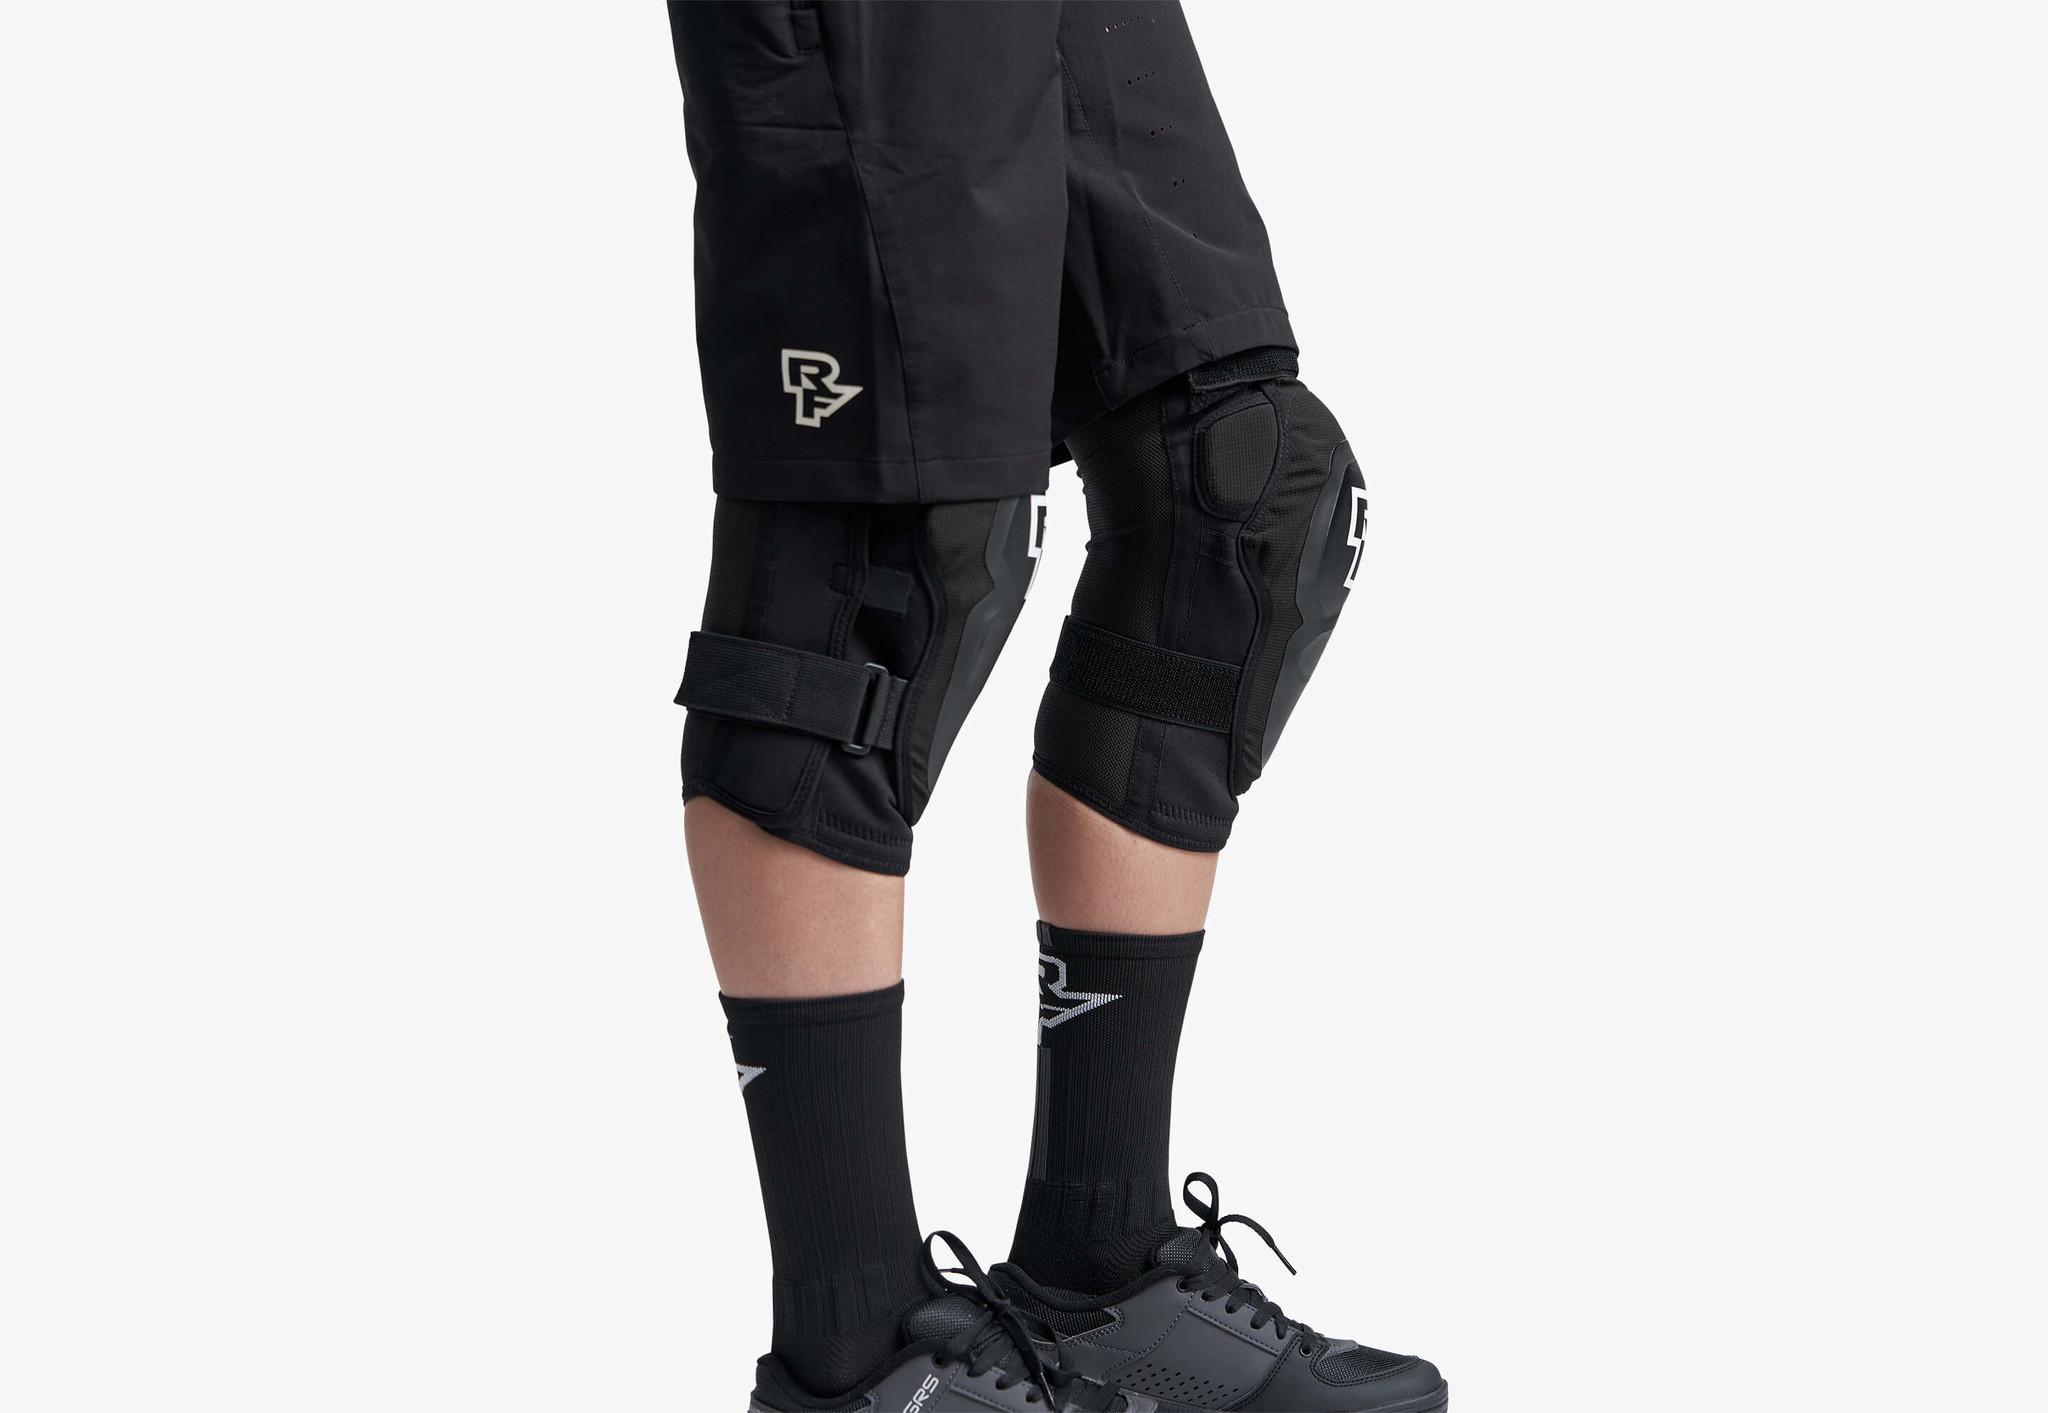 Race Face Roam Knee Pad, Stealth-1